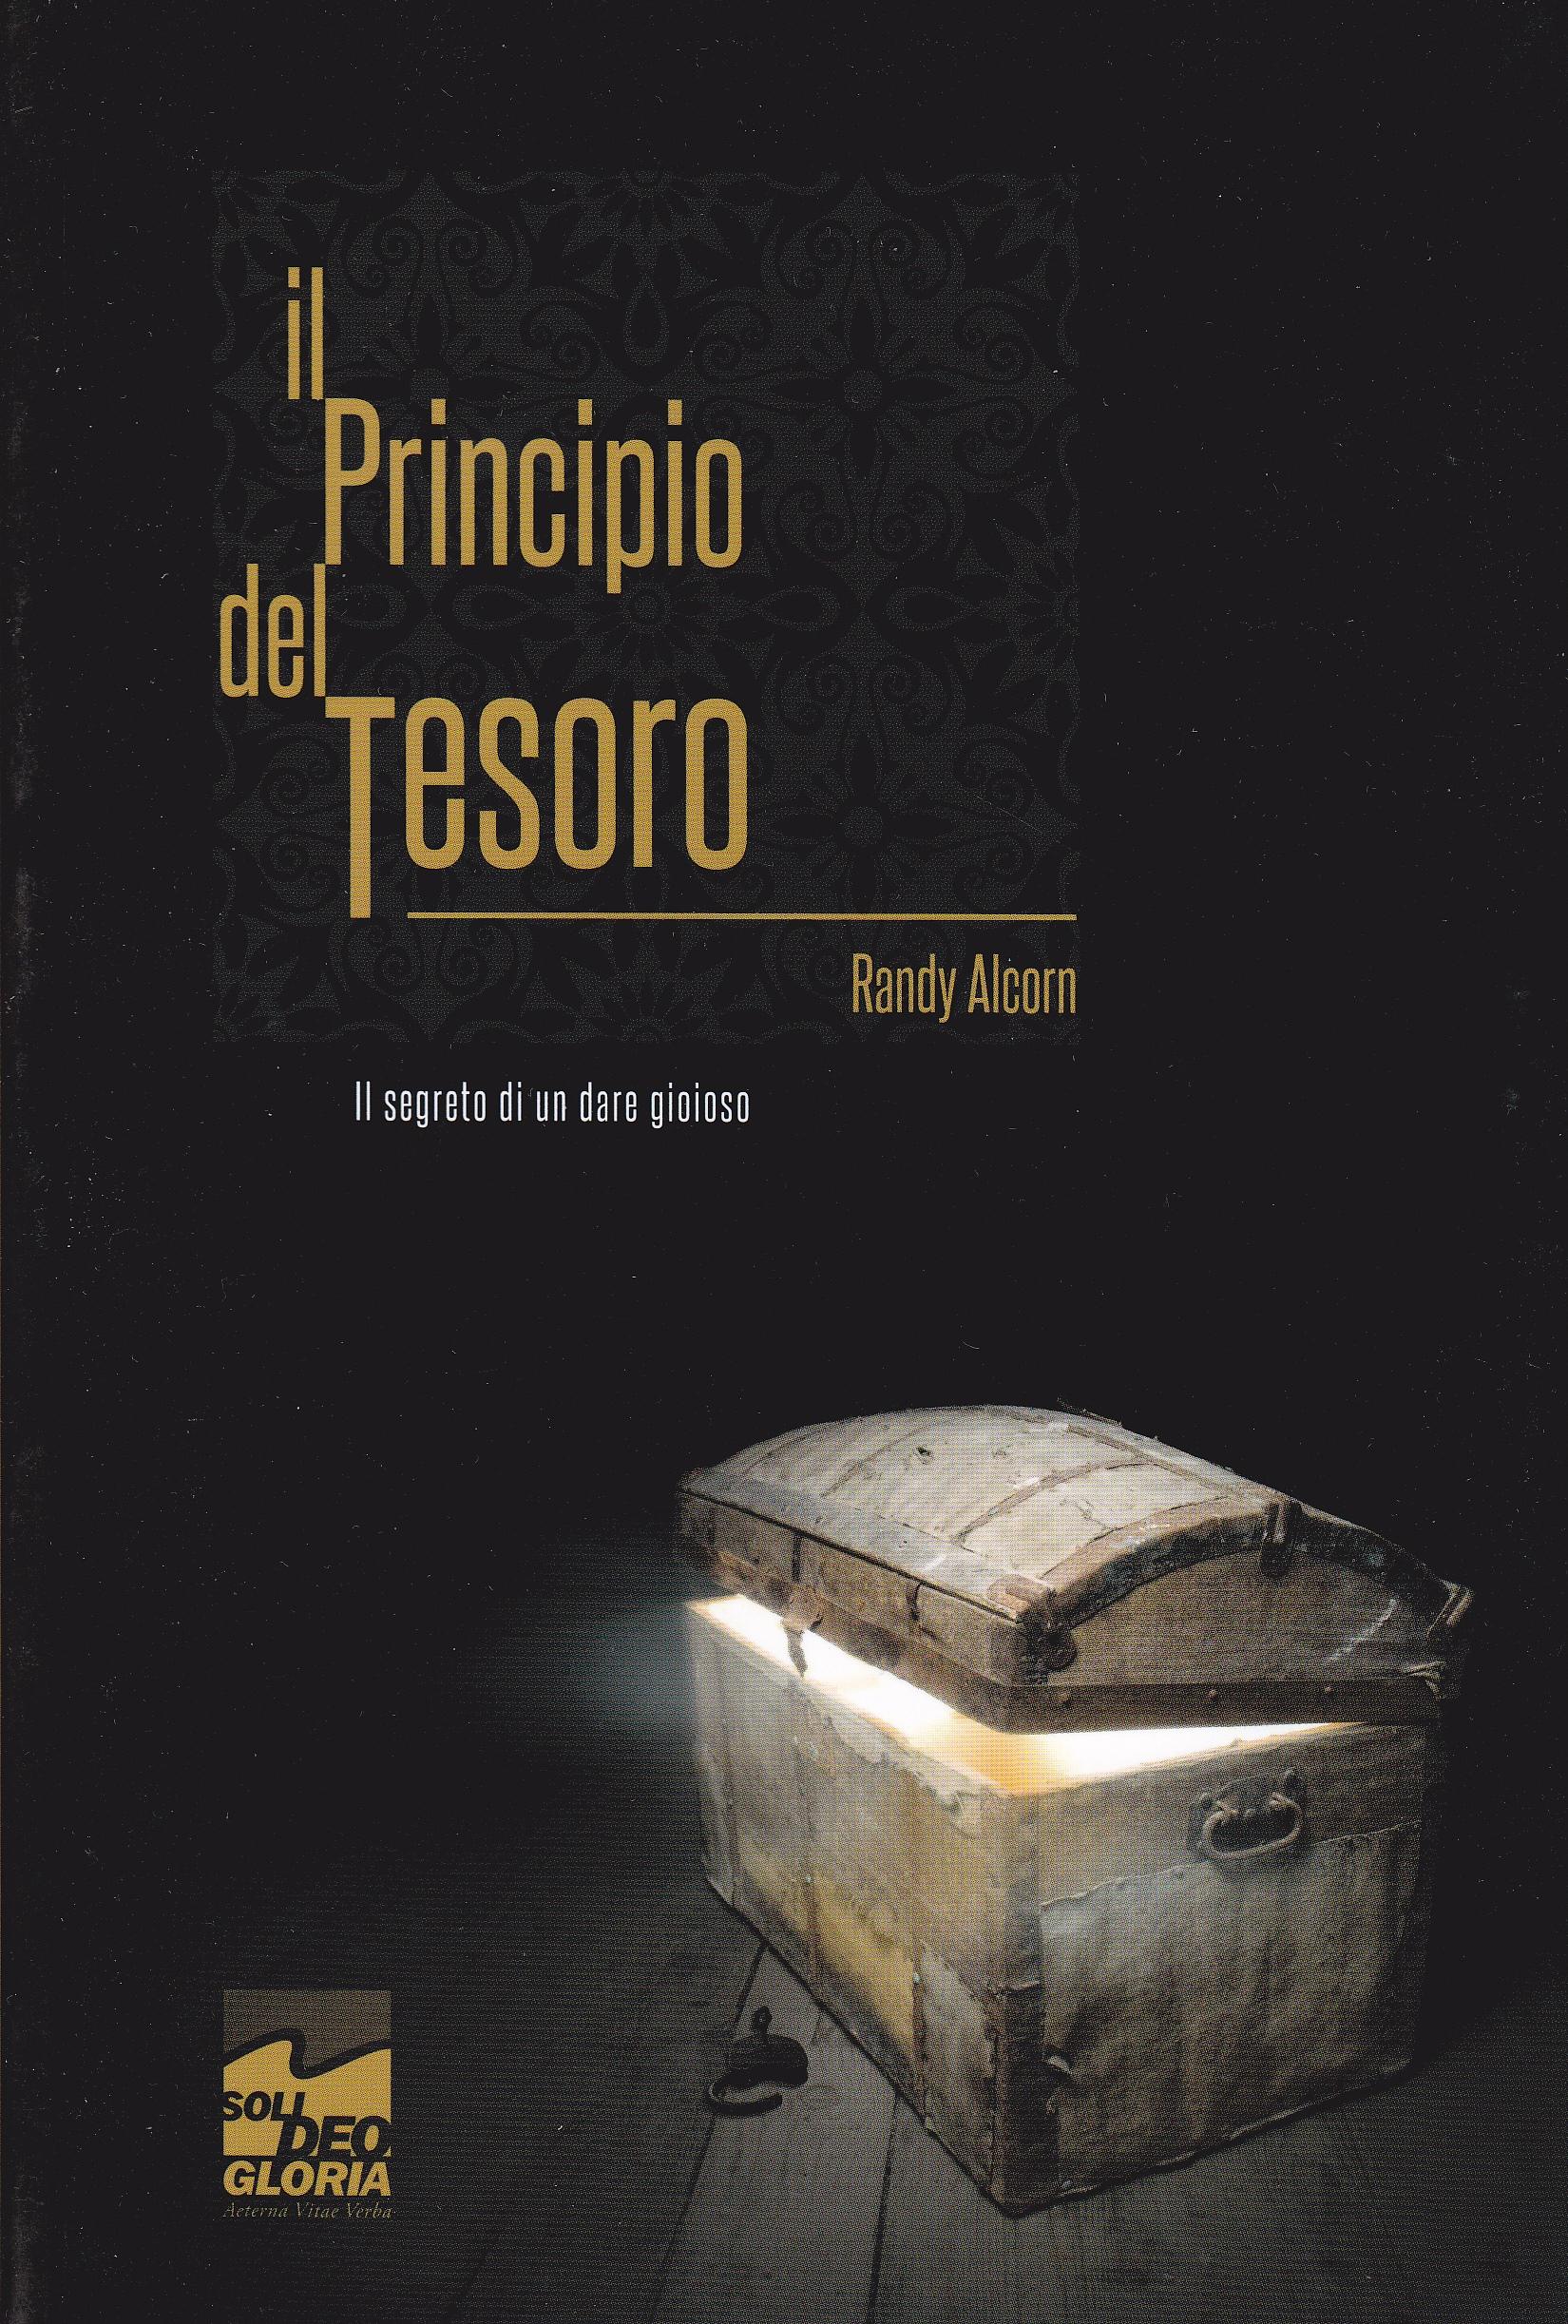 treasure-principle-italian.jpg